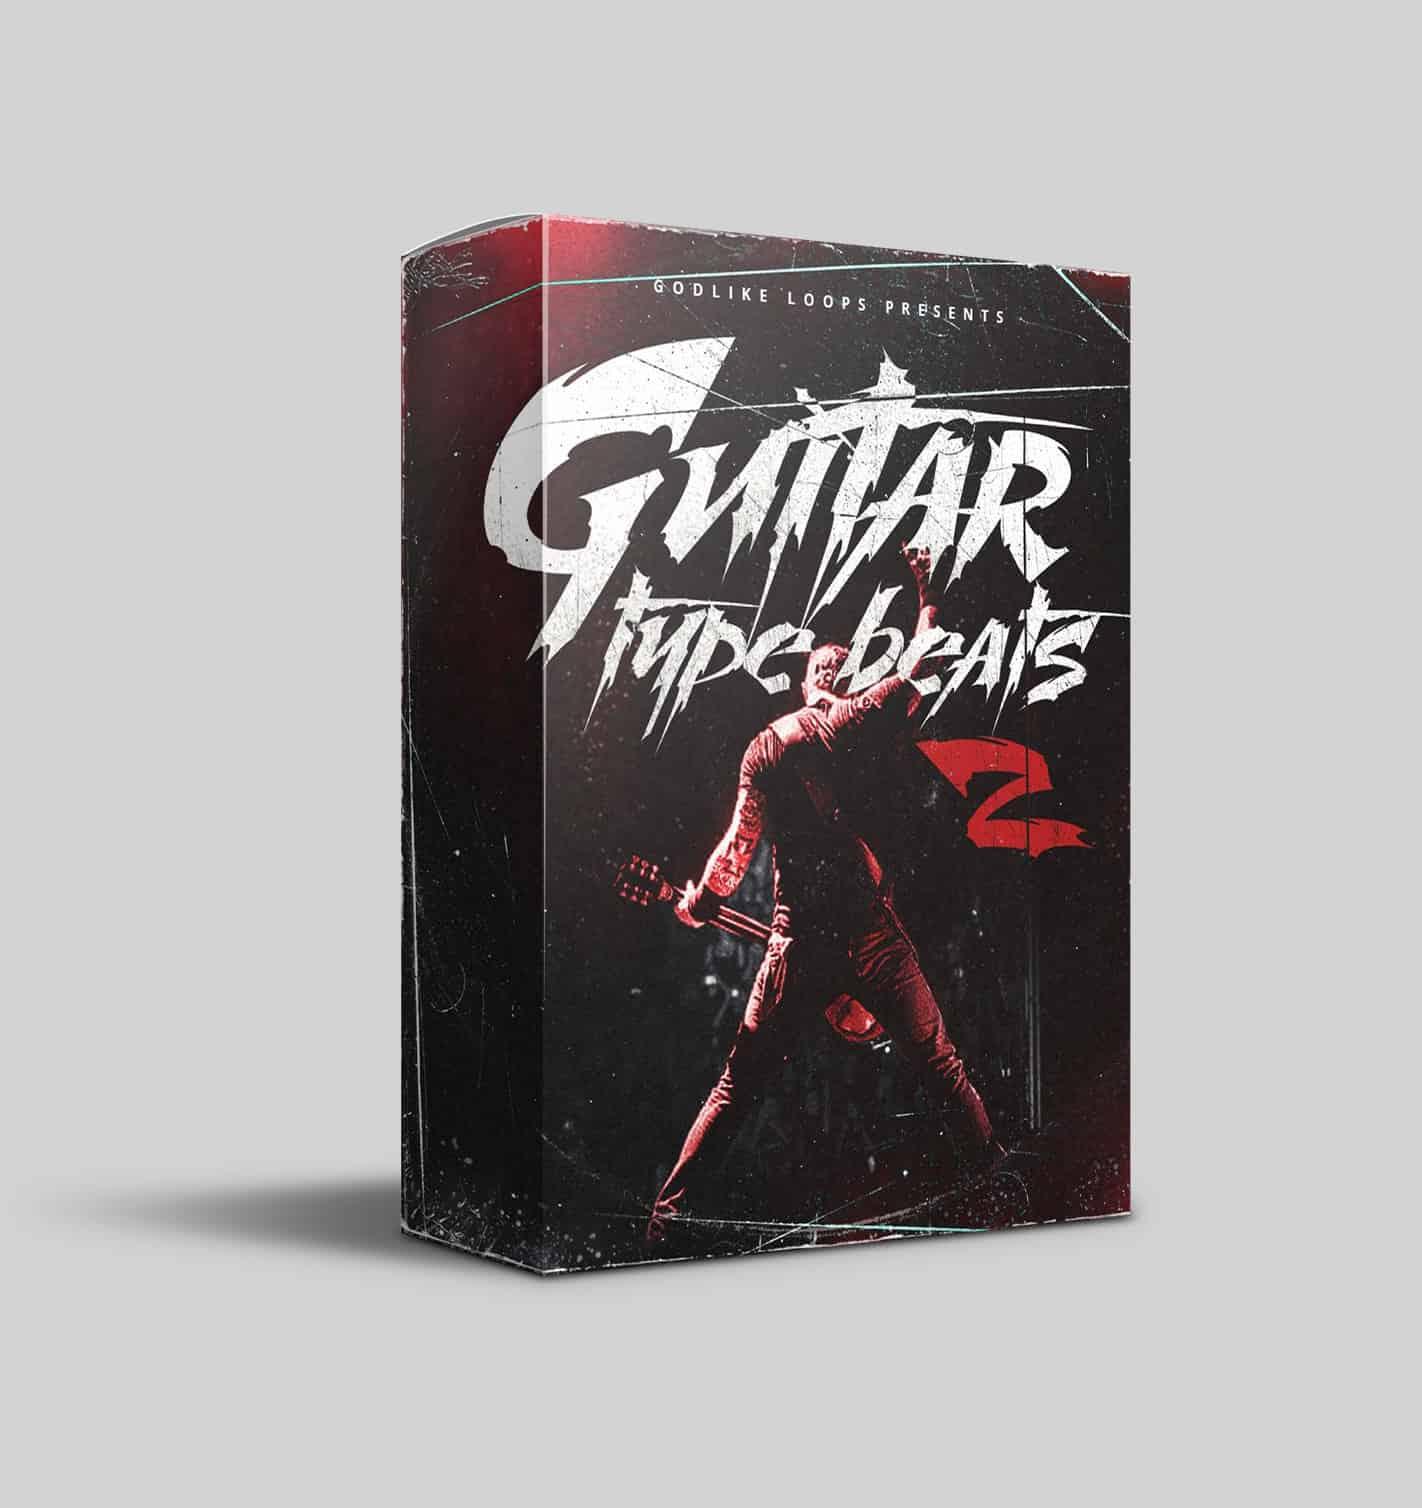 Godlike Loops - Guitar Type Beats 2